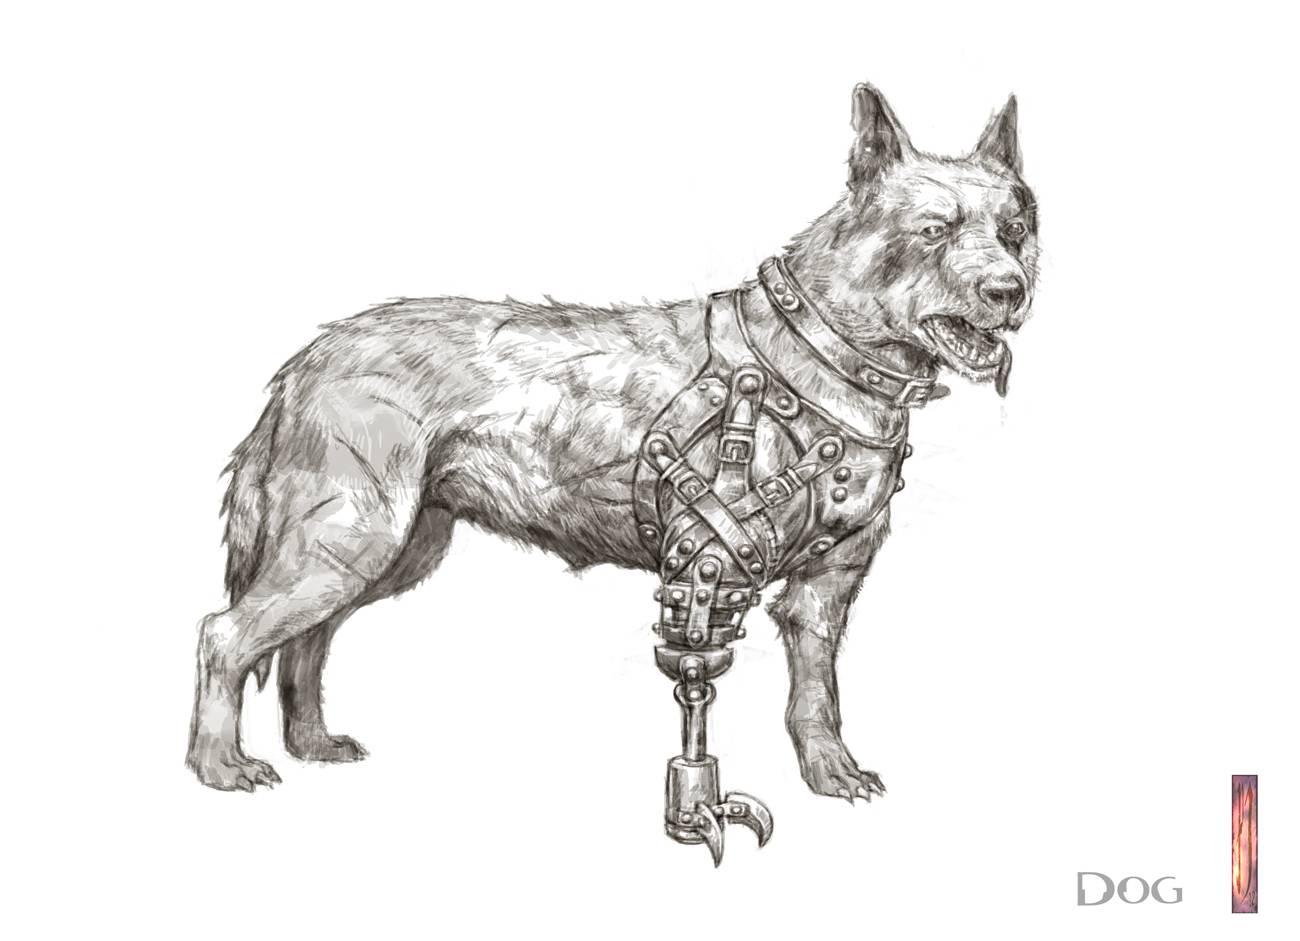 Dog version 2